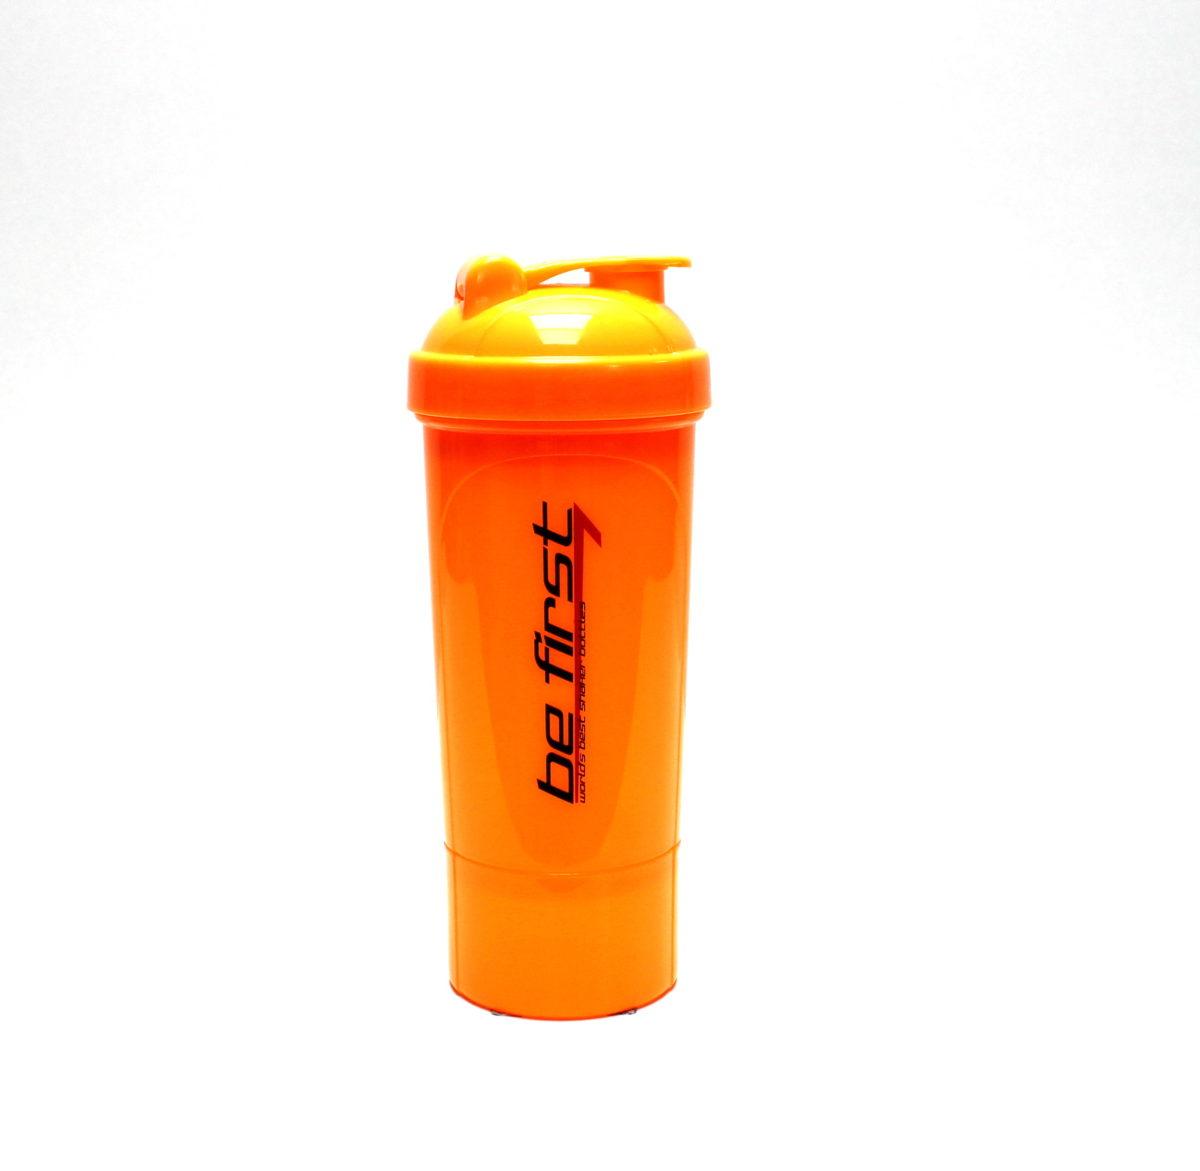 BE FIRST Шейкер-слим 350 мл TS1349: оранжевый - 1